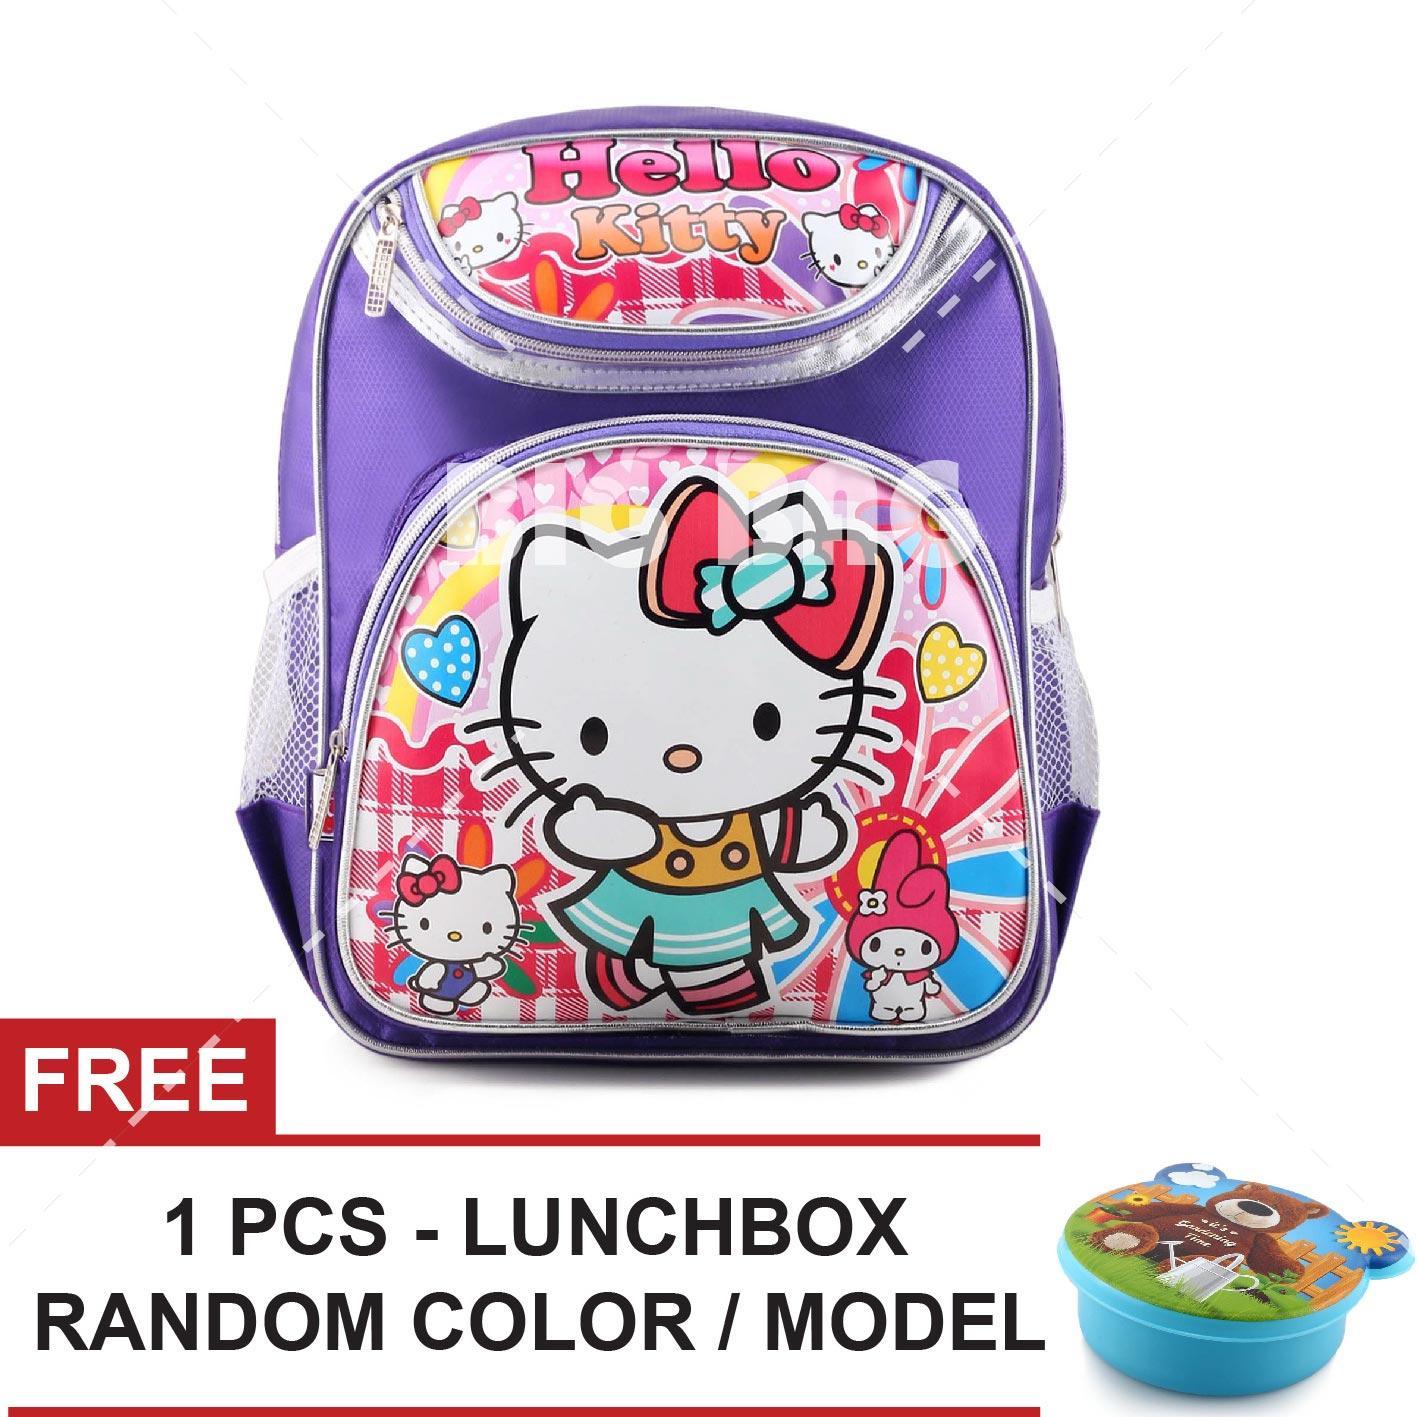 Tas Ransel Anak - HelloKitty - Candy Girls - FAW School Bag Tas Sekolah Anak - PURPLE + FREE  Lunchbox Random Color / Model Tas Anak Tas Sekolah Tas Anak Karakter